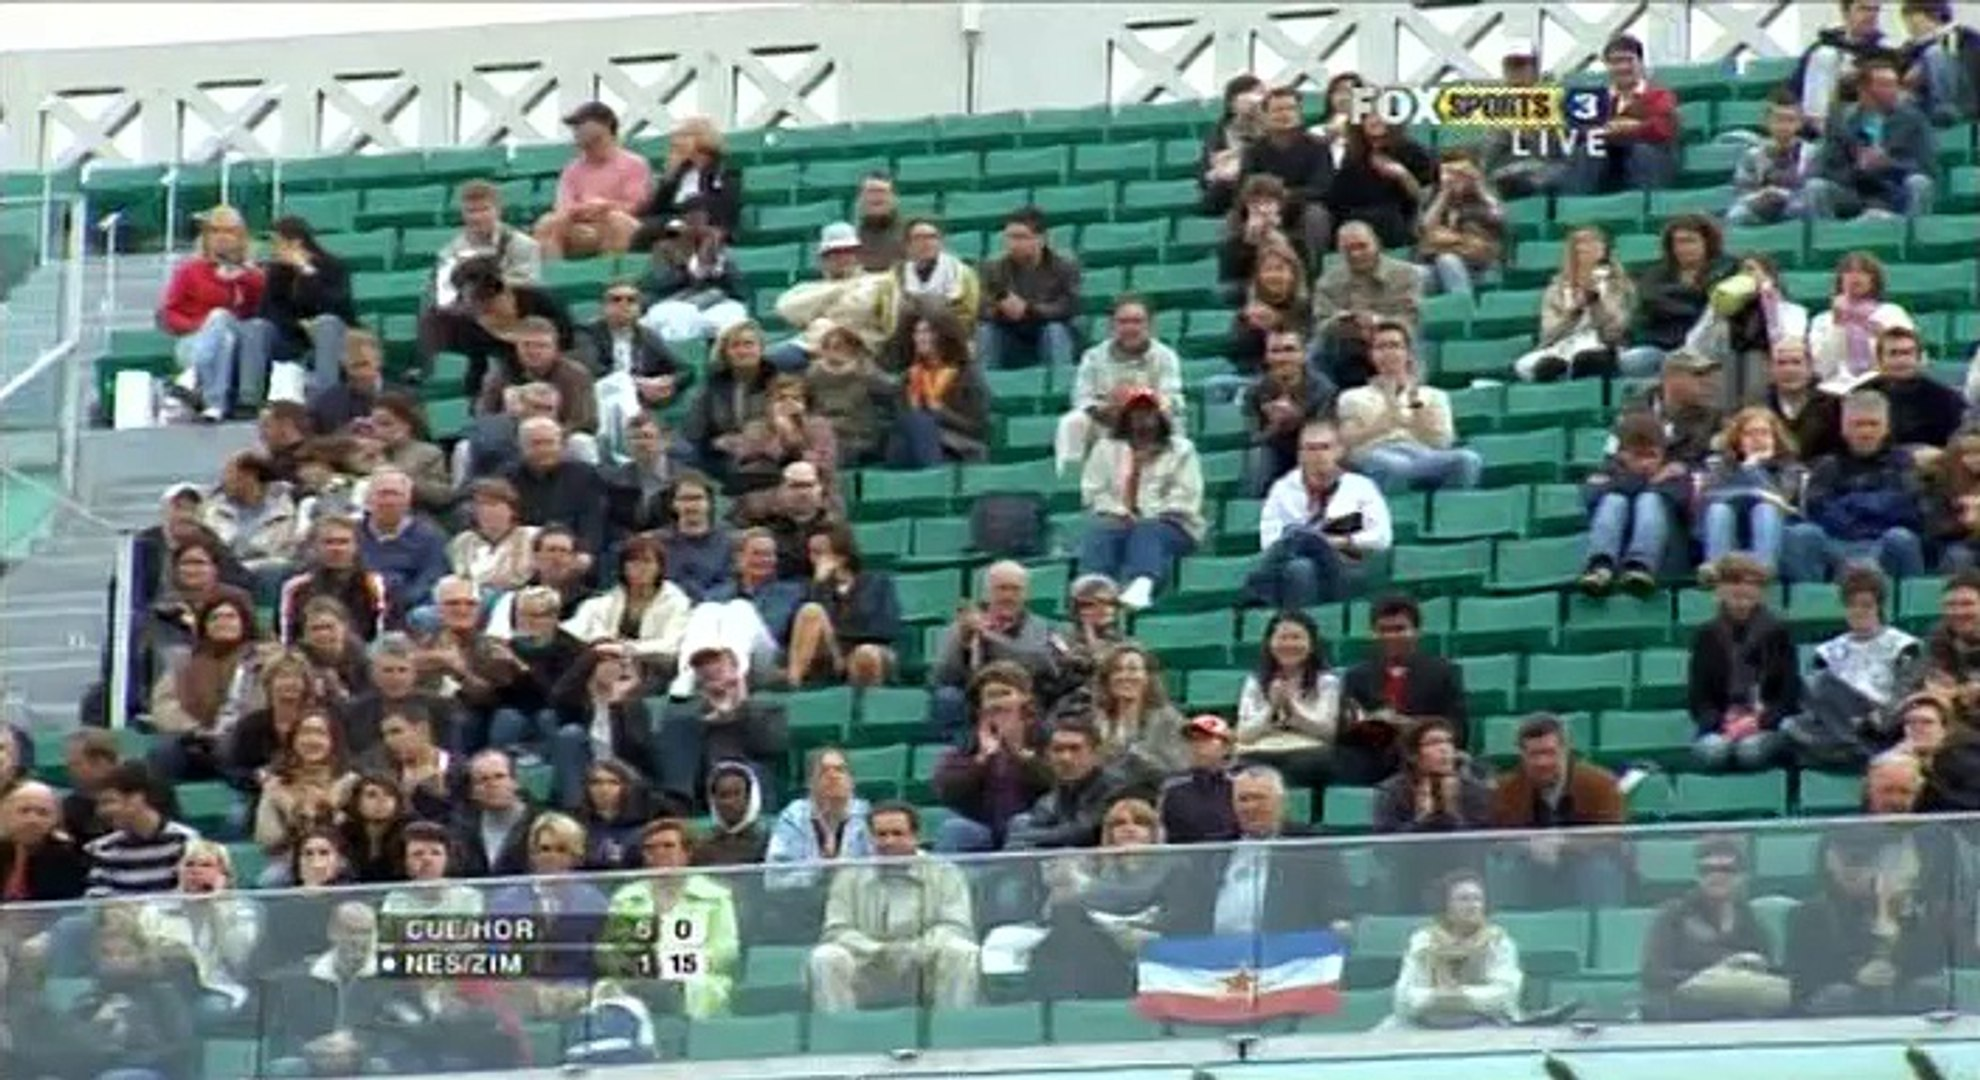 2008 French Open Men's Doubles - Final (Cuevas-Horna vs Nestor-Zimonjic)